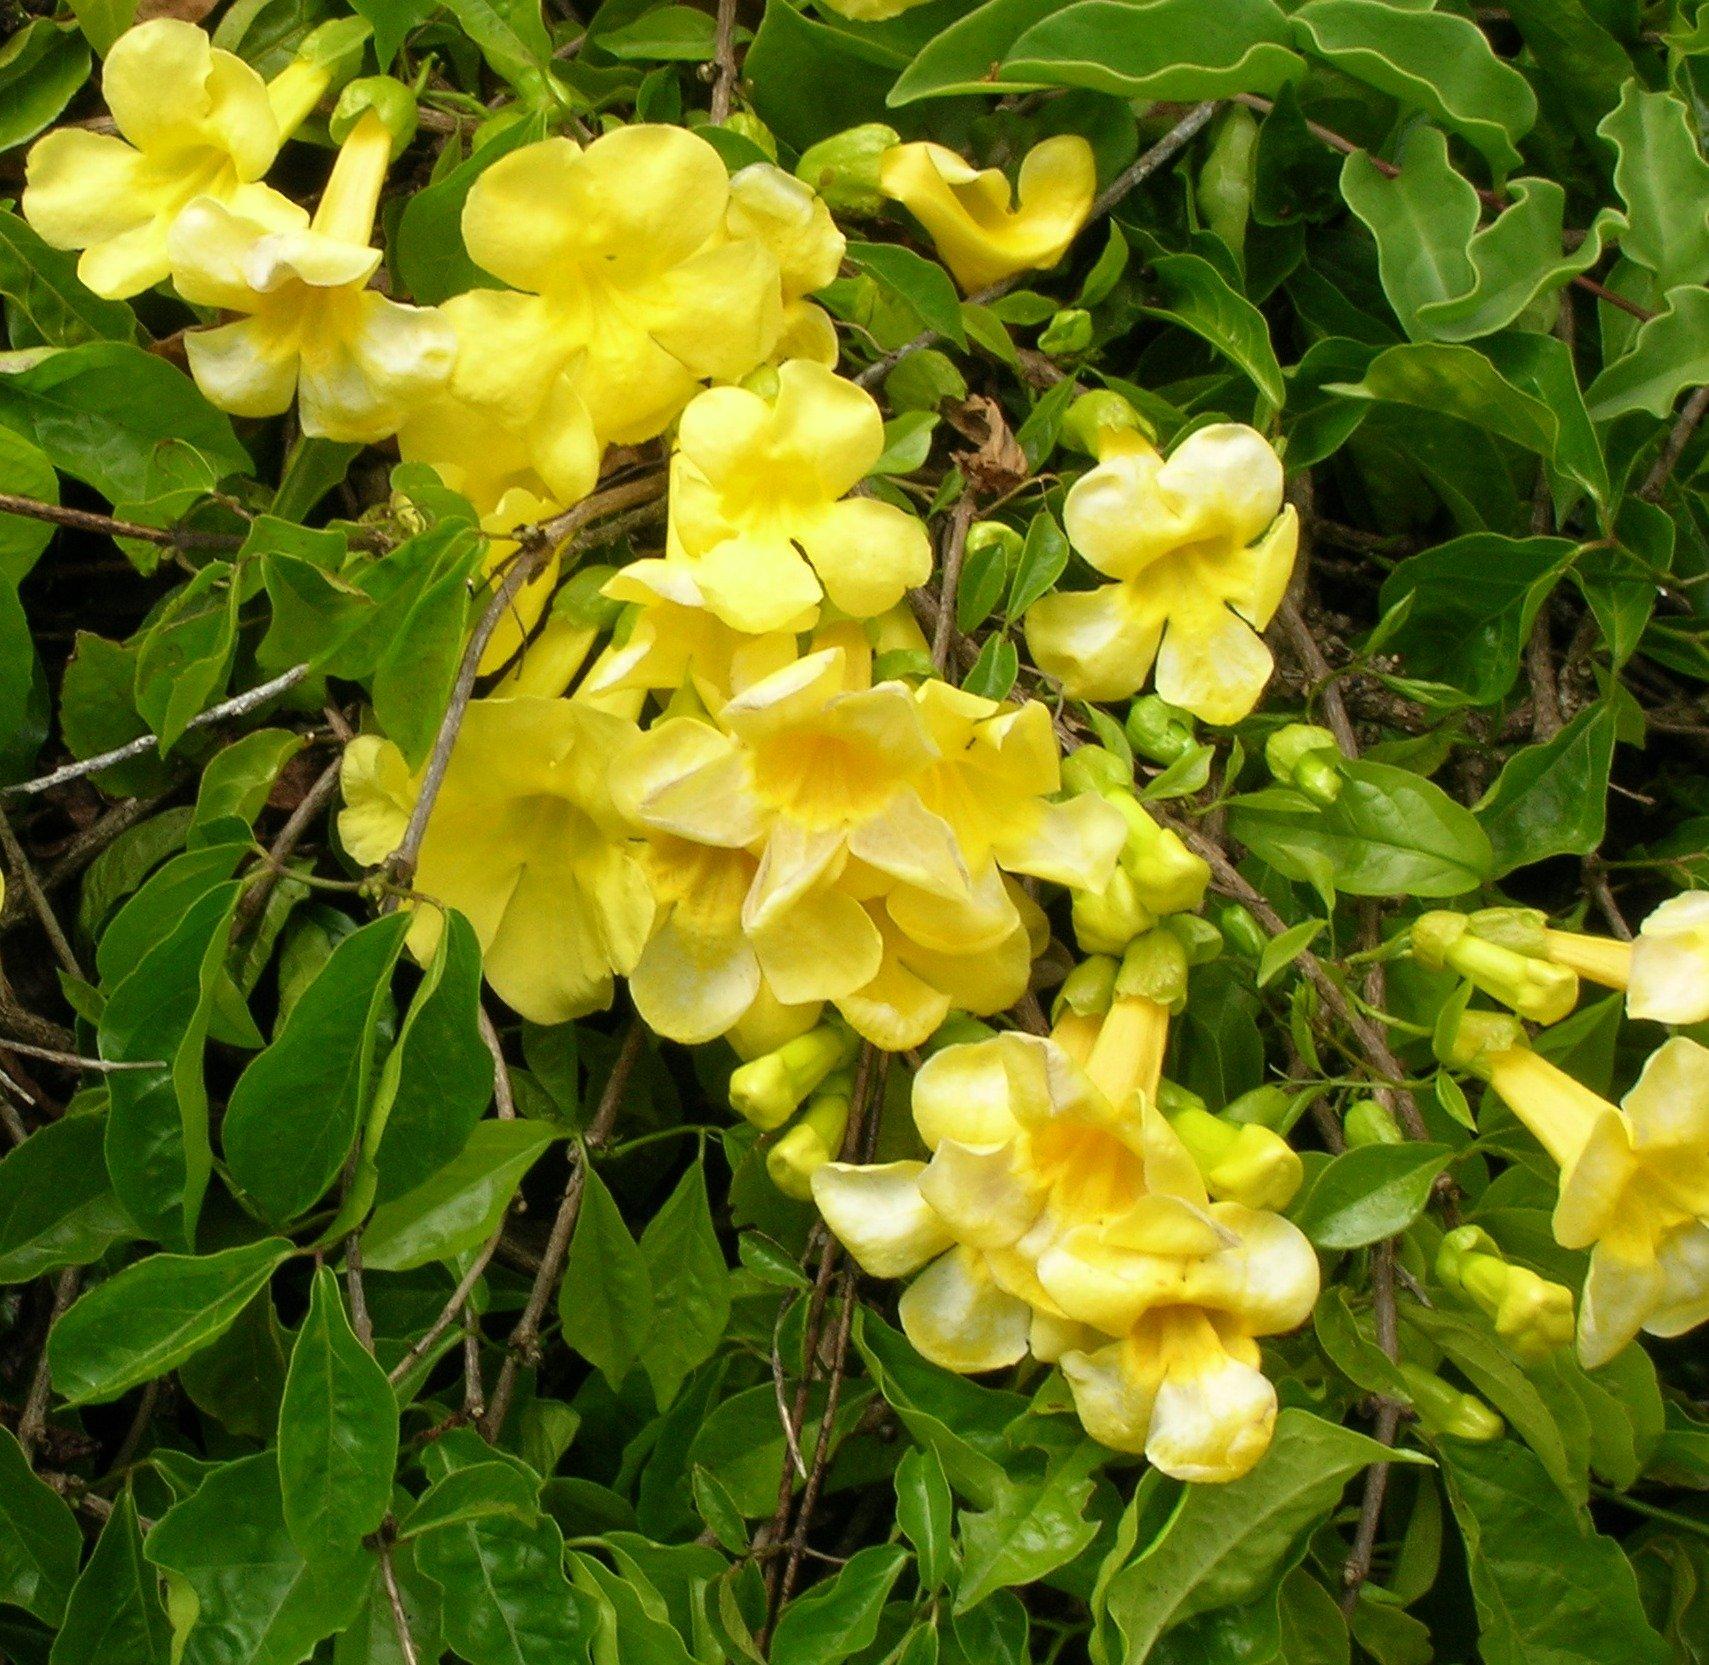 1 Yellow Trumpet Vine Plant in 2.5'' Pot, Climbing Vine GS